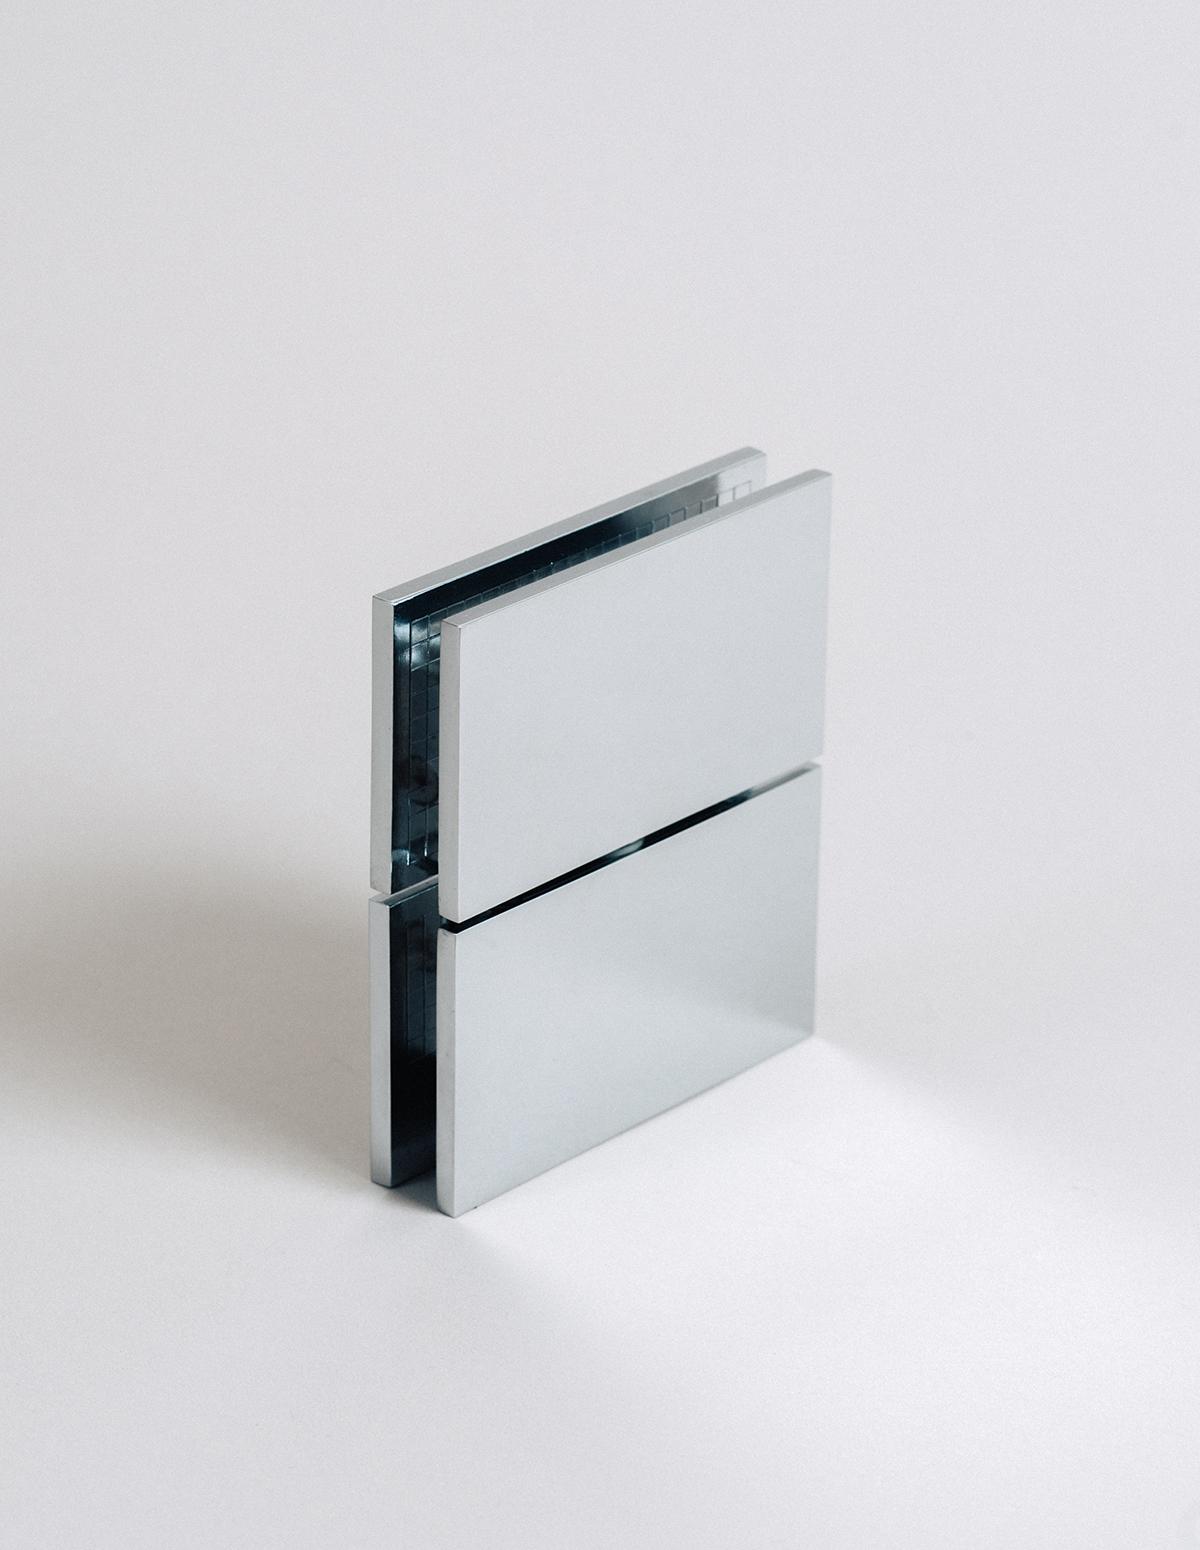 Optimum-Studios-Architectural-Glass-Metal-HardwarePage-Hinge6-042216